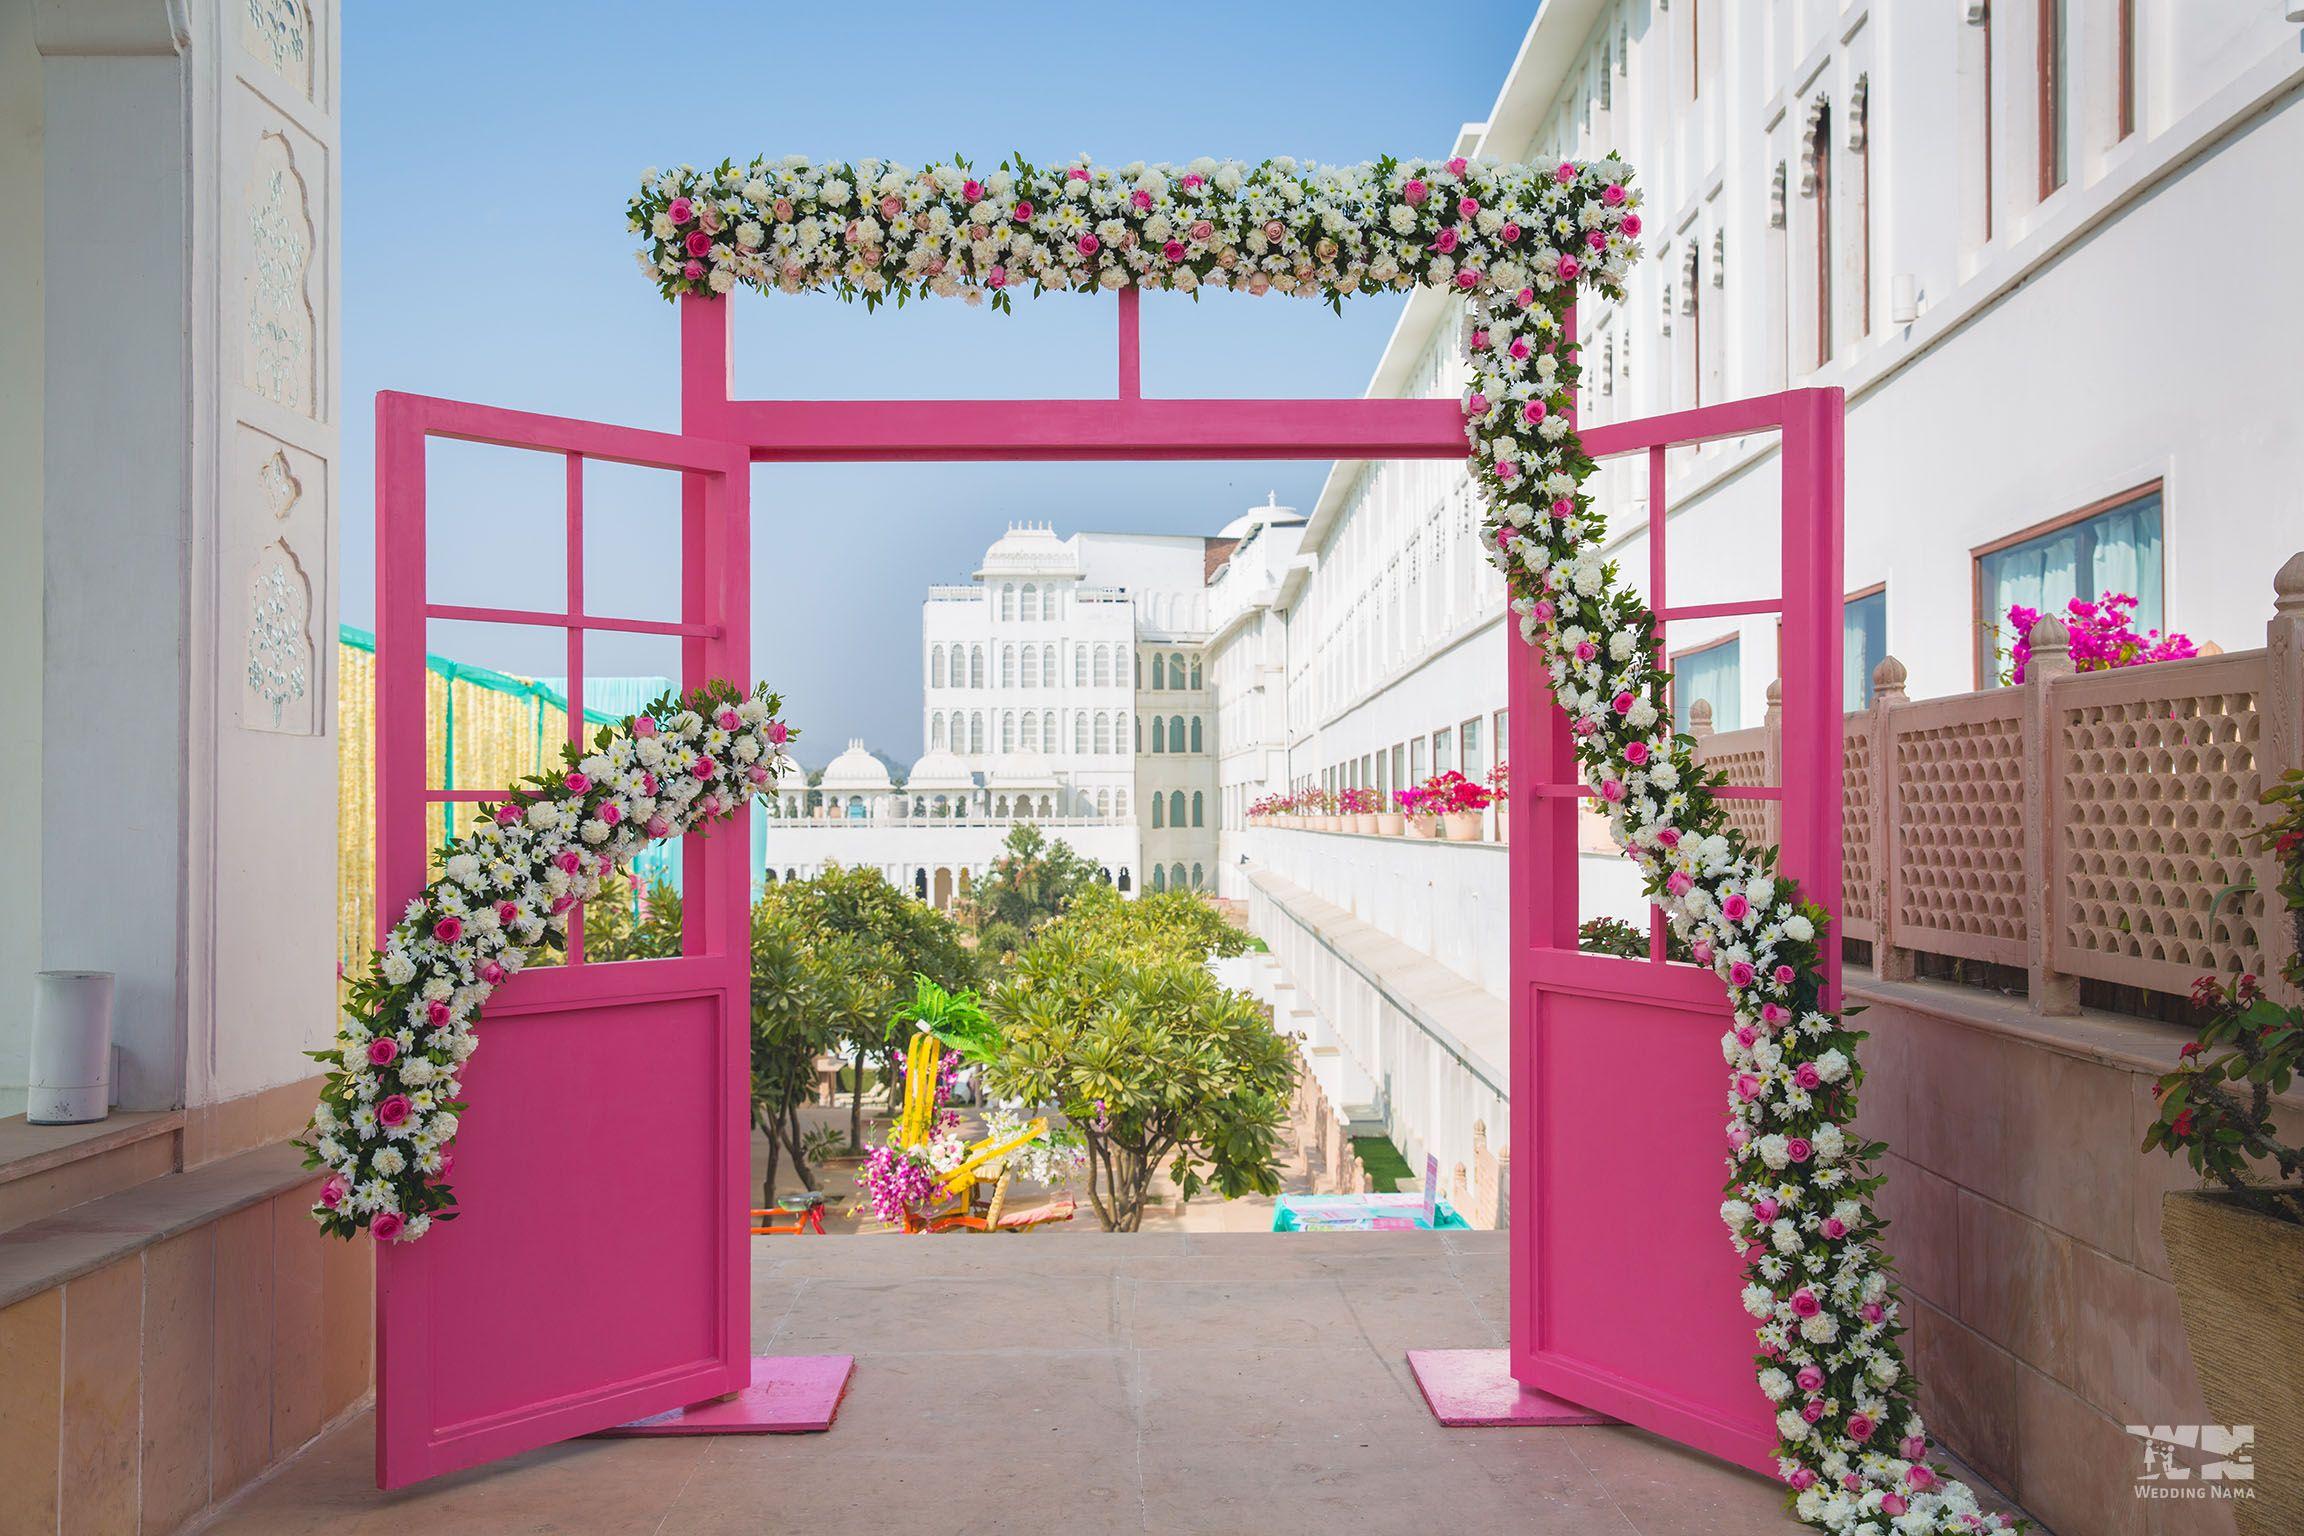 Rajasthani wedding stage decoration  Door to la la land pinkdoor weddingdecor decor decorideas